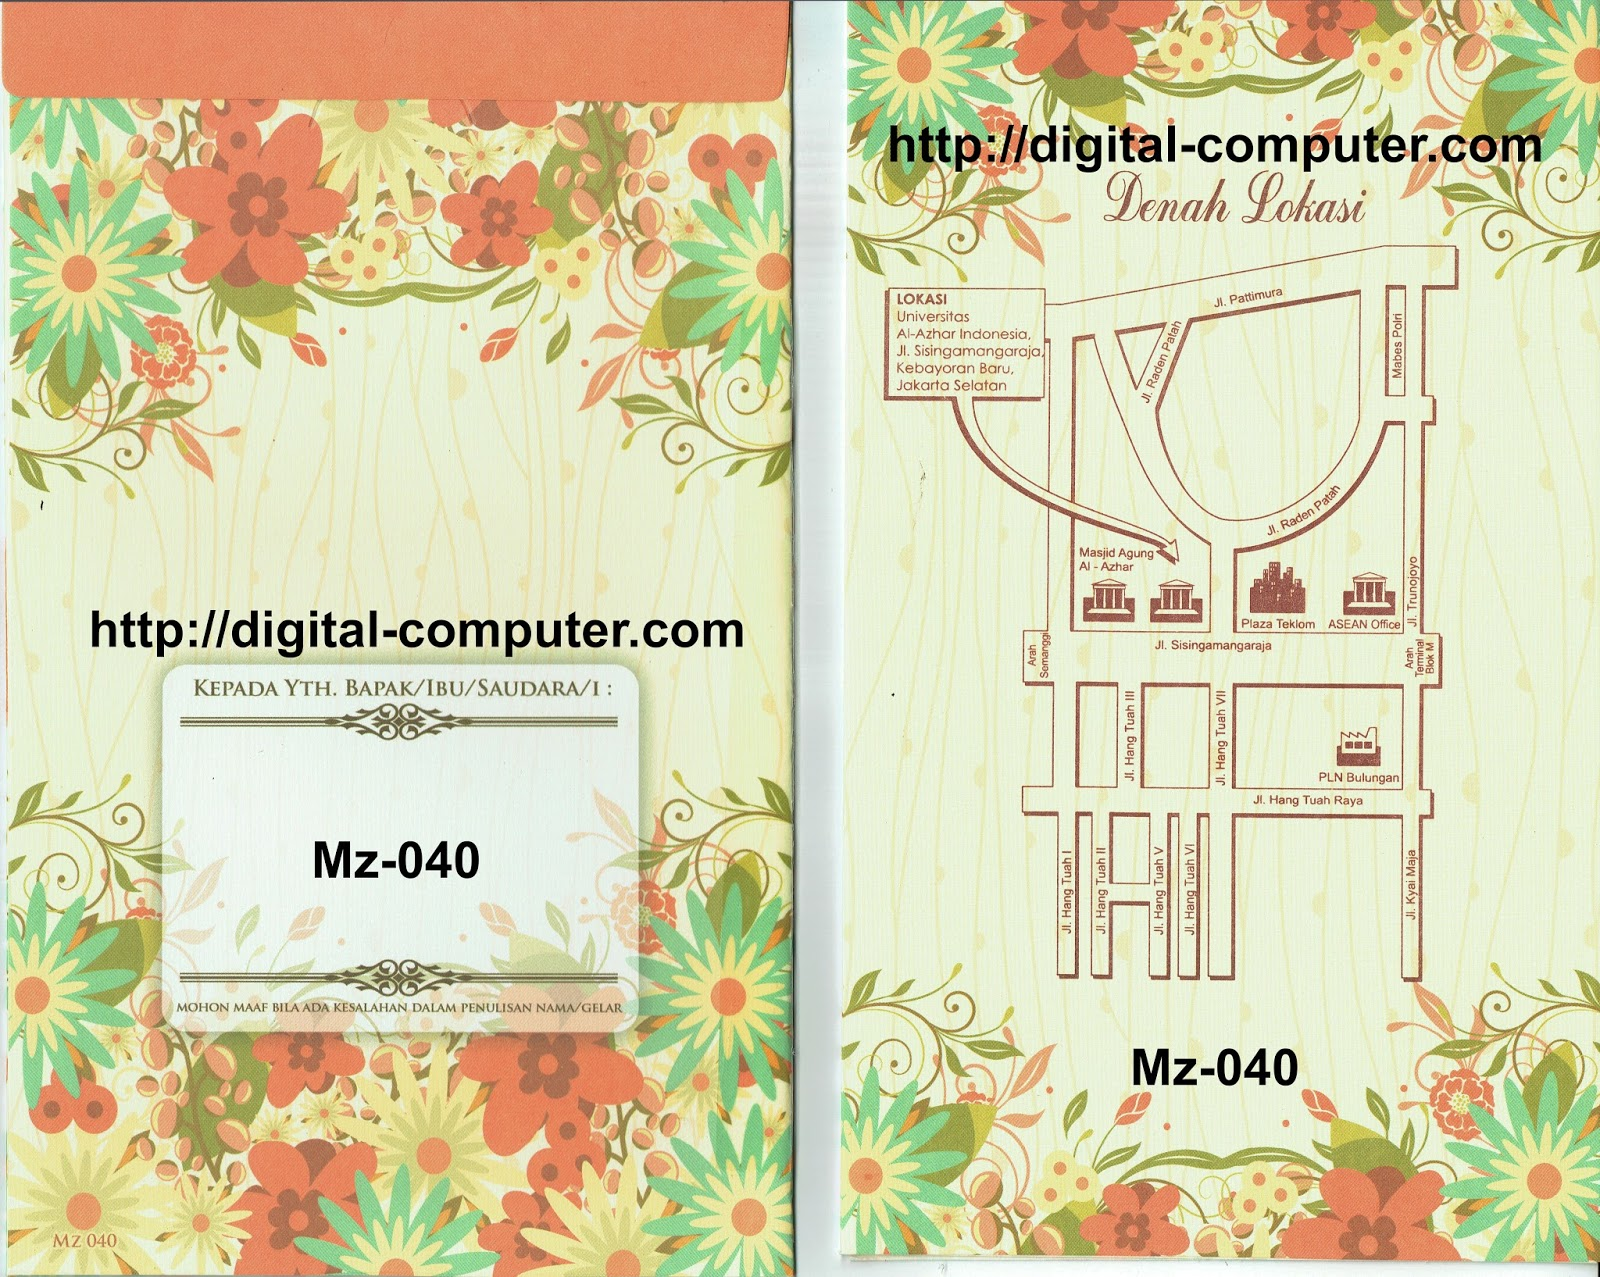 Undangan Softcover Mz-040